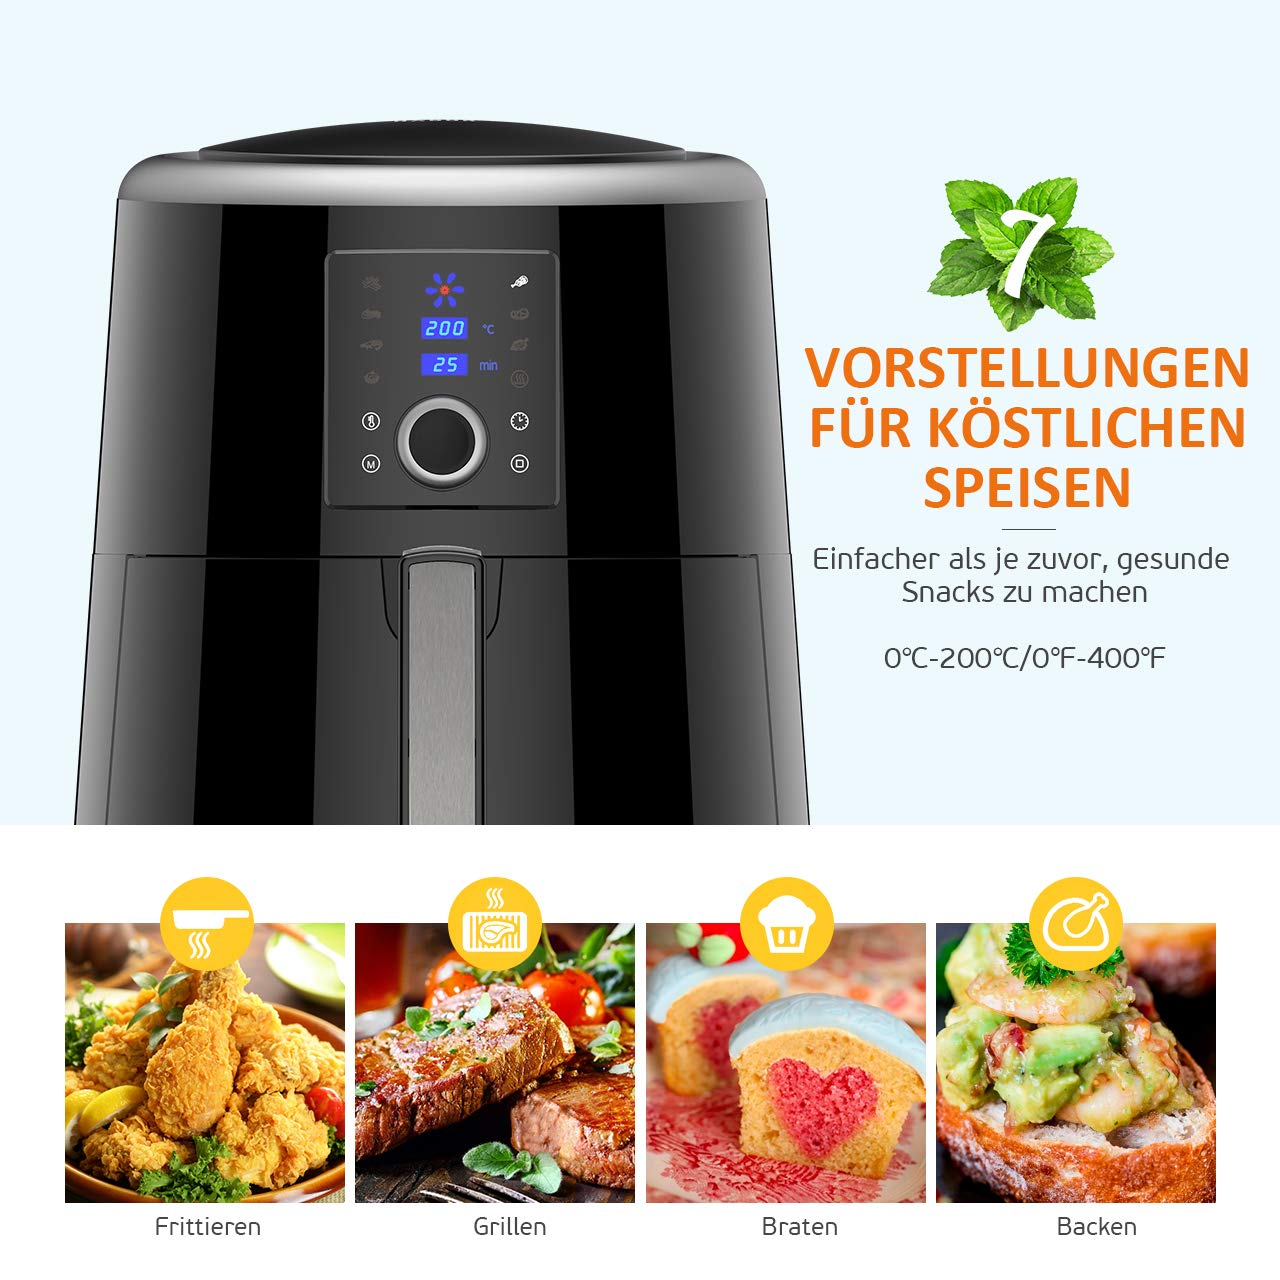 Habor Fritteuse Hei/ßluftfritteuse XXL Digitale Airfryer 1800W Fritteuse 5.5L f/ür 5-8 Personen Programmierbares 7-in-1 Touchscreen /& Auswahlrad 120-Minuten-W/ärmehaltefunktion /& Rezeptbuch.